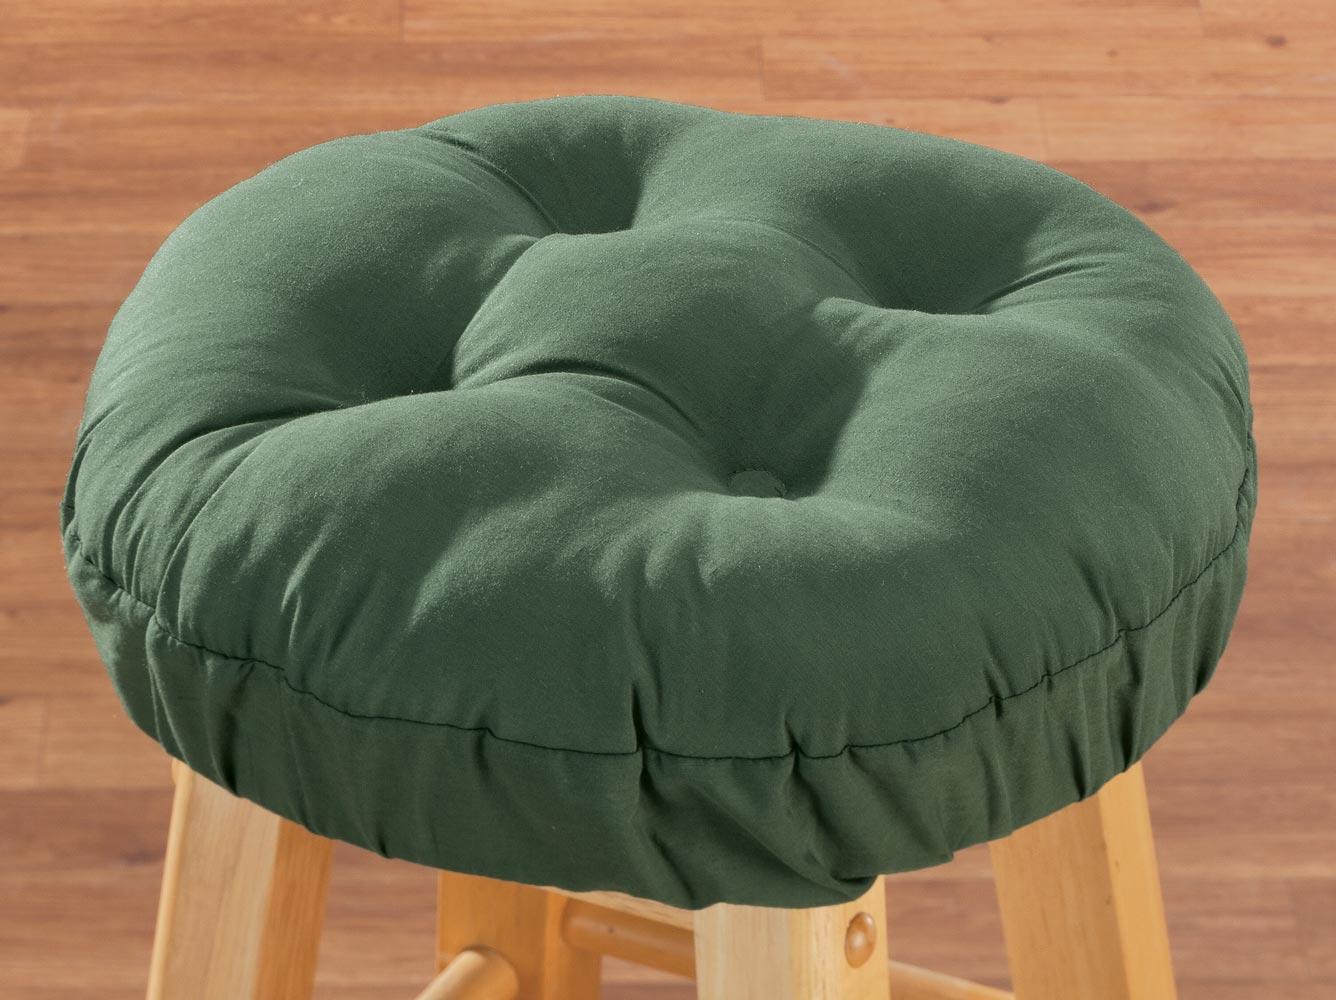 WalterDrake Tufted Bar Stool Cushion eBay : wbg347604bhunter from www.ebay.com size 1336 x 1000 jpeg 145kB